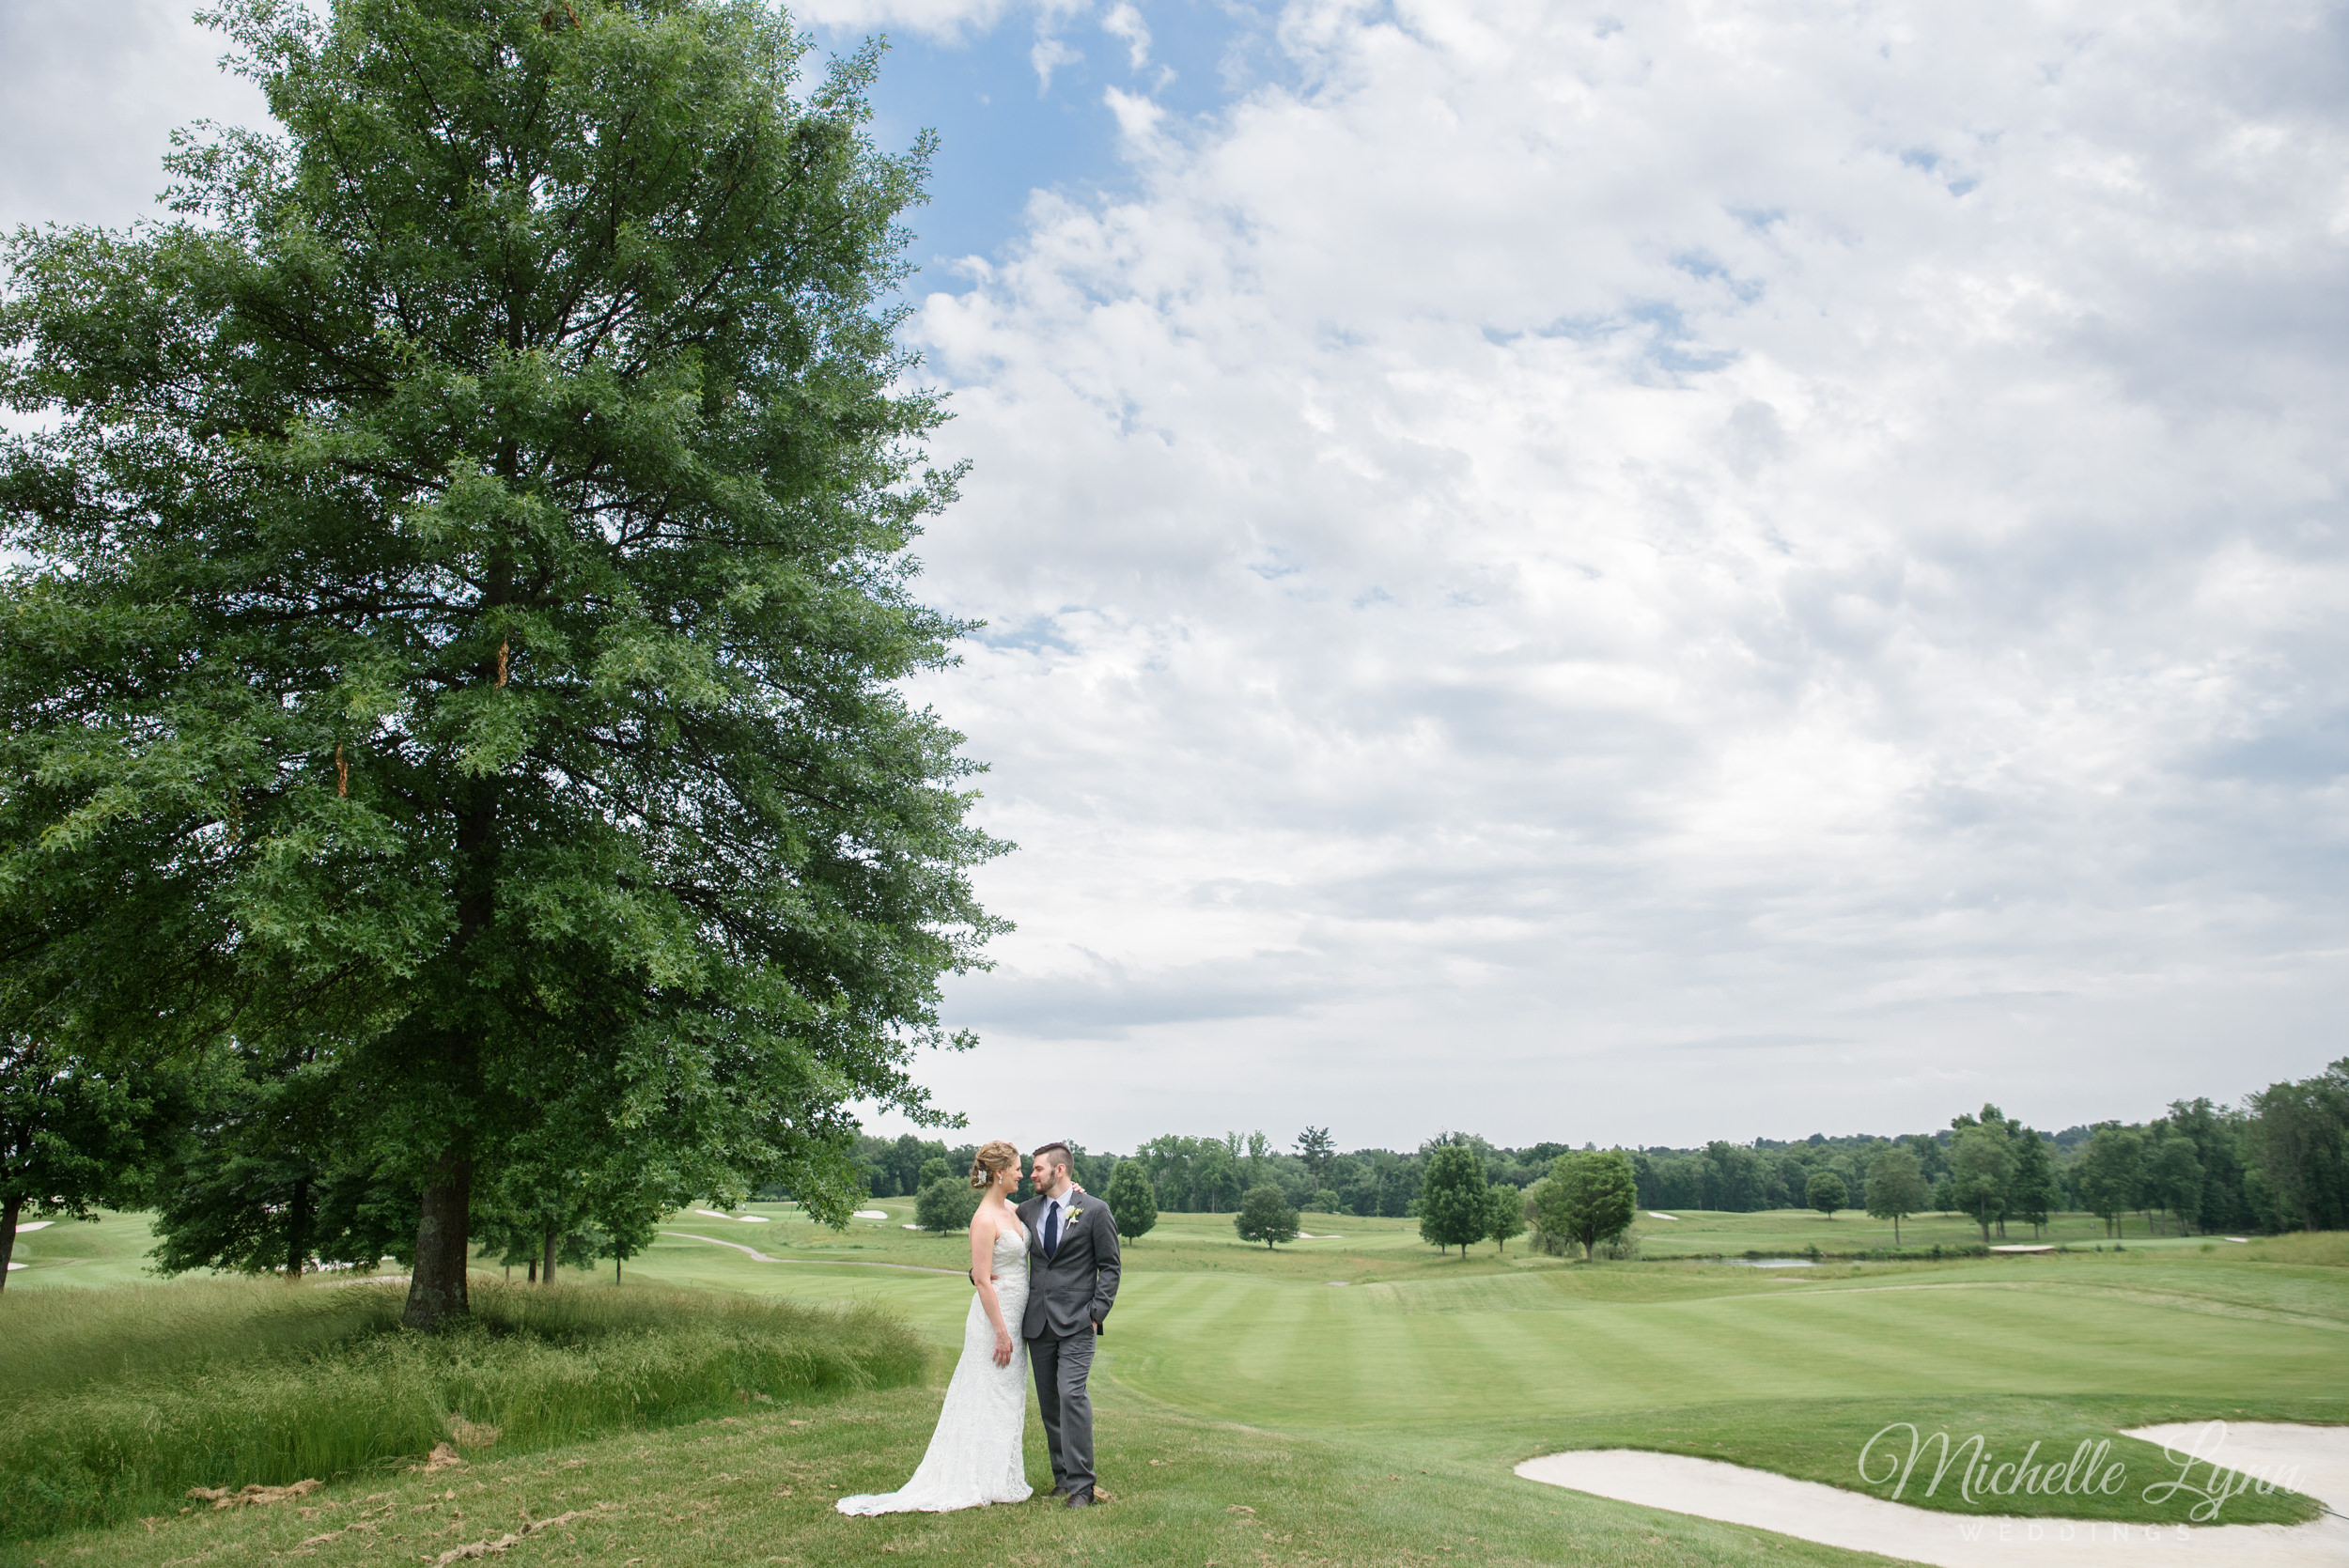 mlw-jericho-national-golf-club-wedding-photography-43.jpg